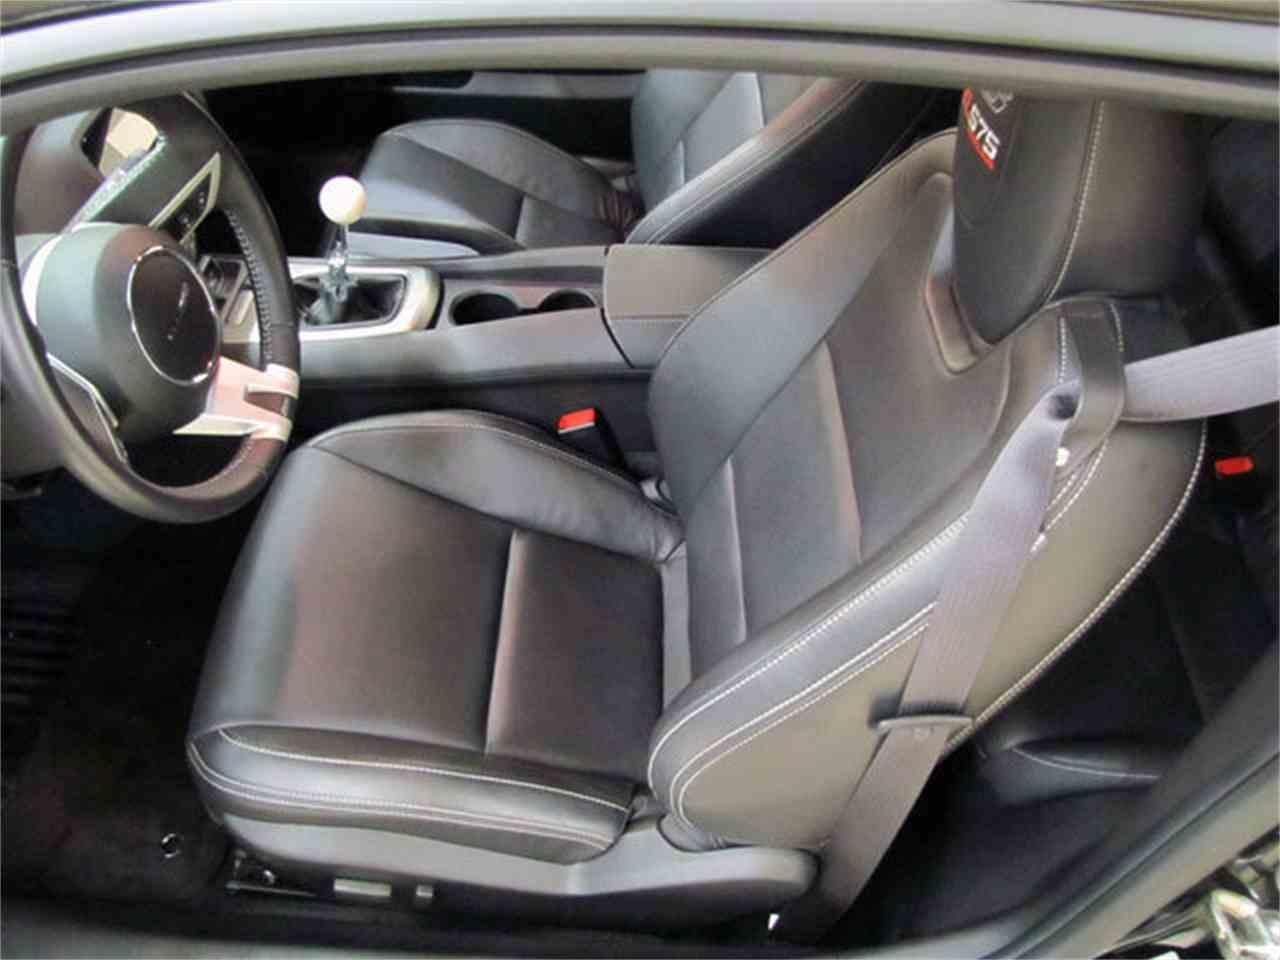 Large Picture of '10 Chevrolet Camaro SLP ZL 575 located in North Carolina - $39,995.00 - JQ2R